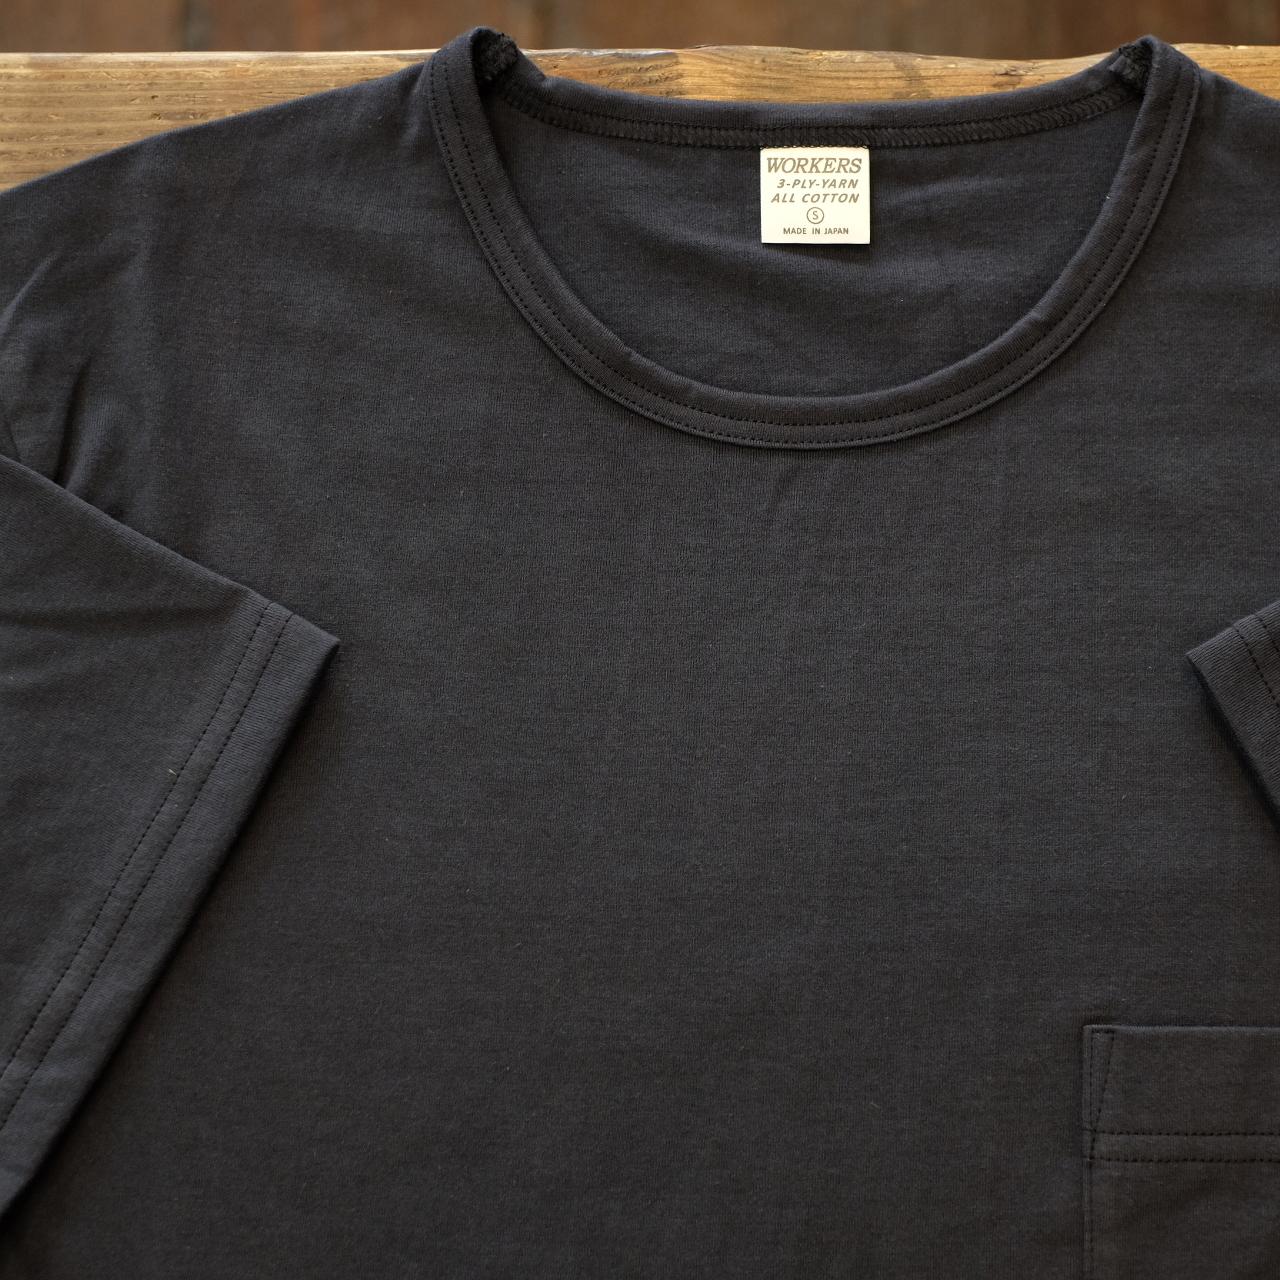 Workers(ワーカーズ) 別注 3PLYスリム ポケットTシャツ フェードブラック